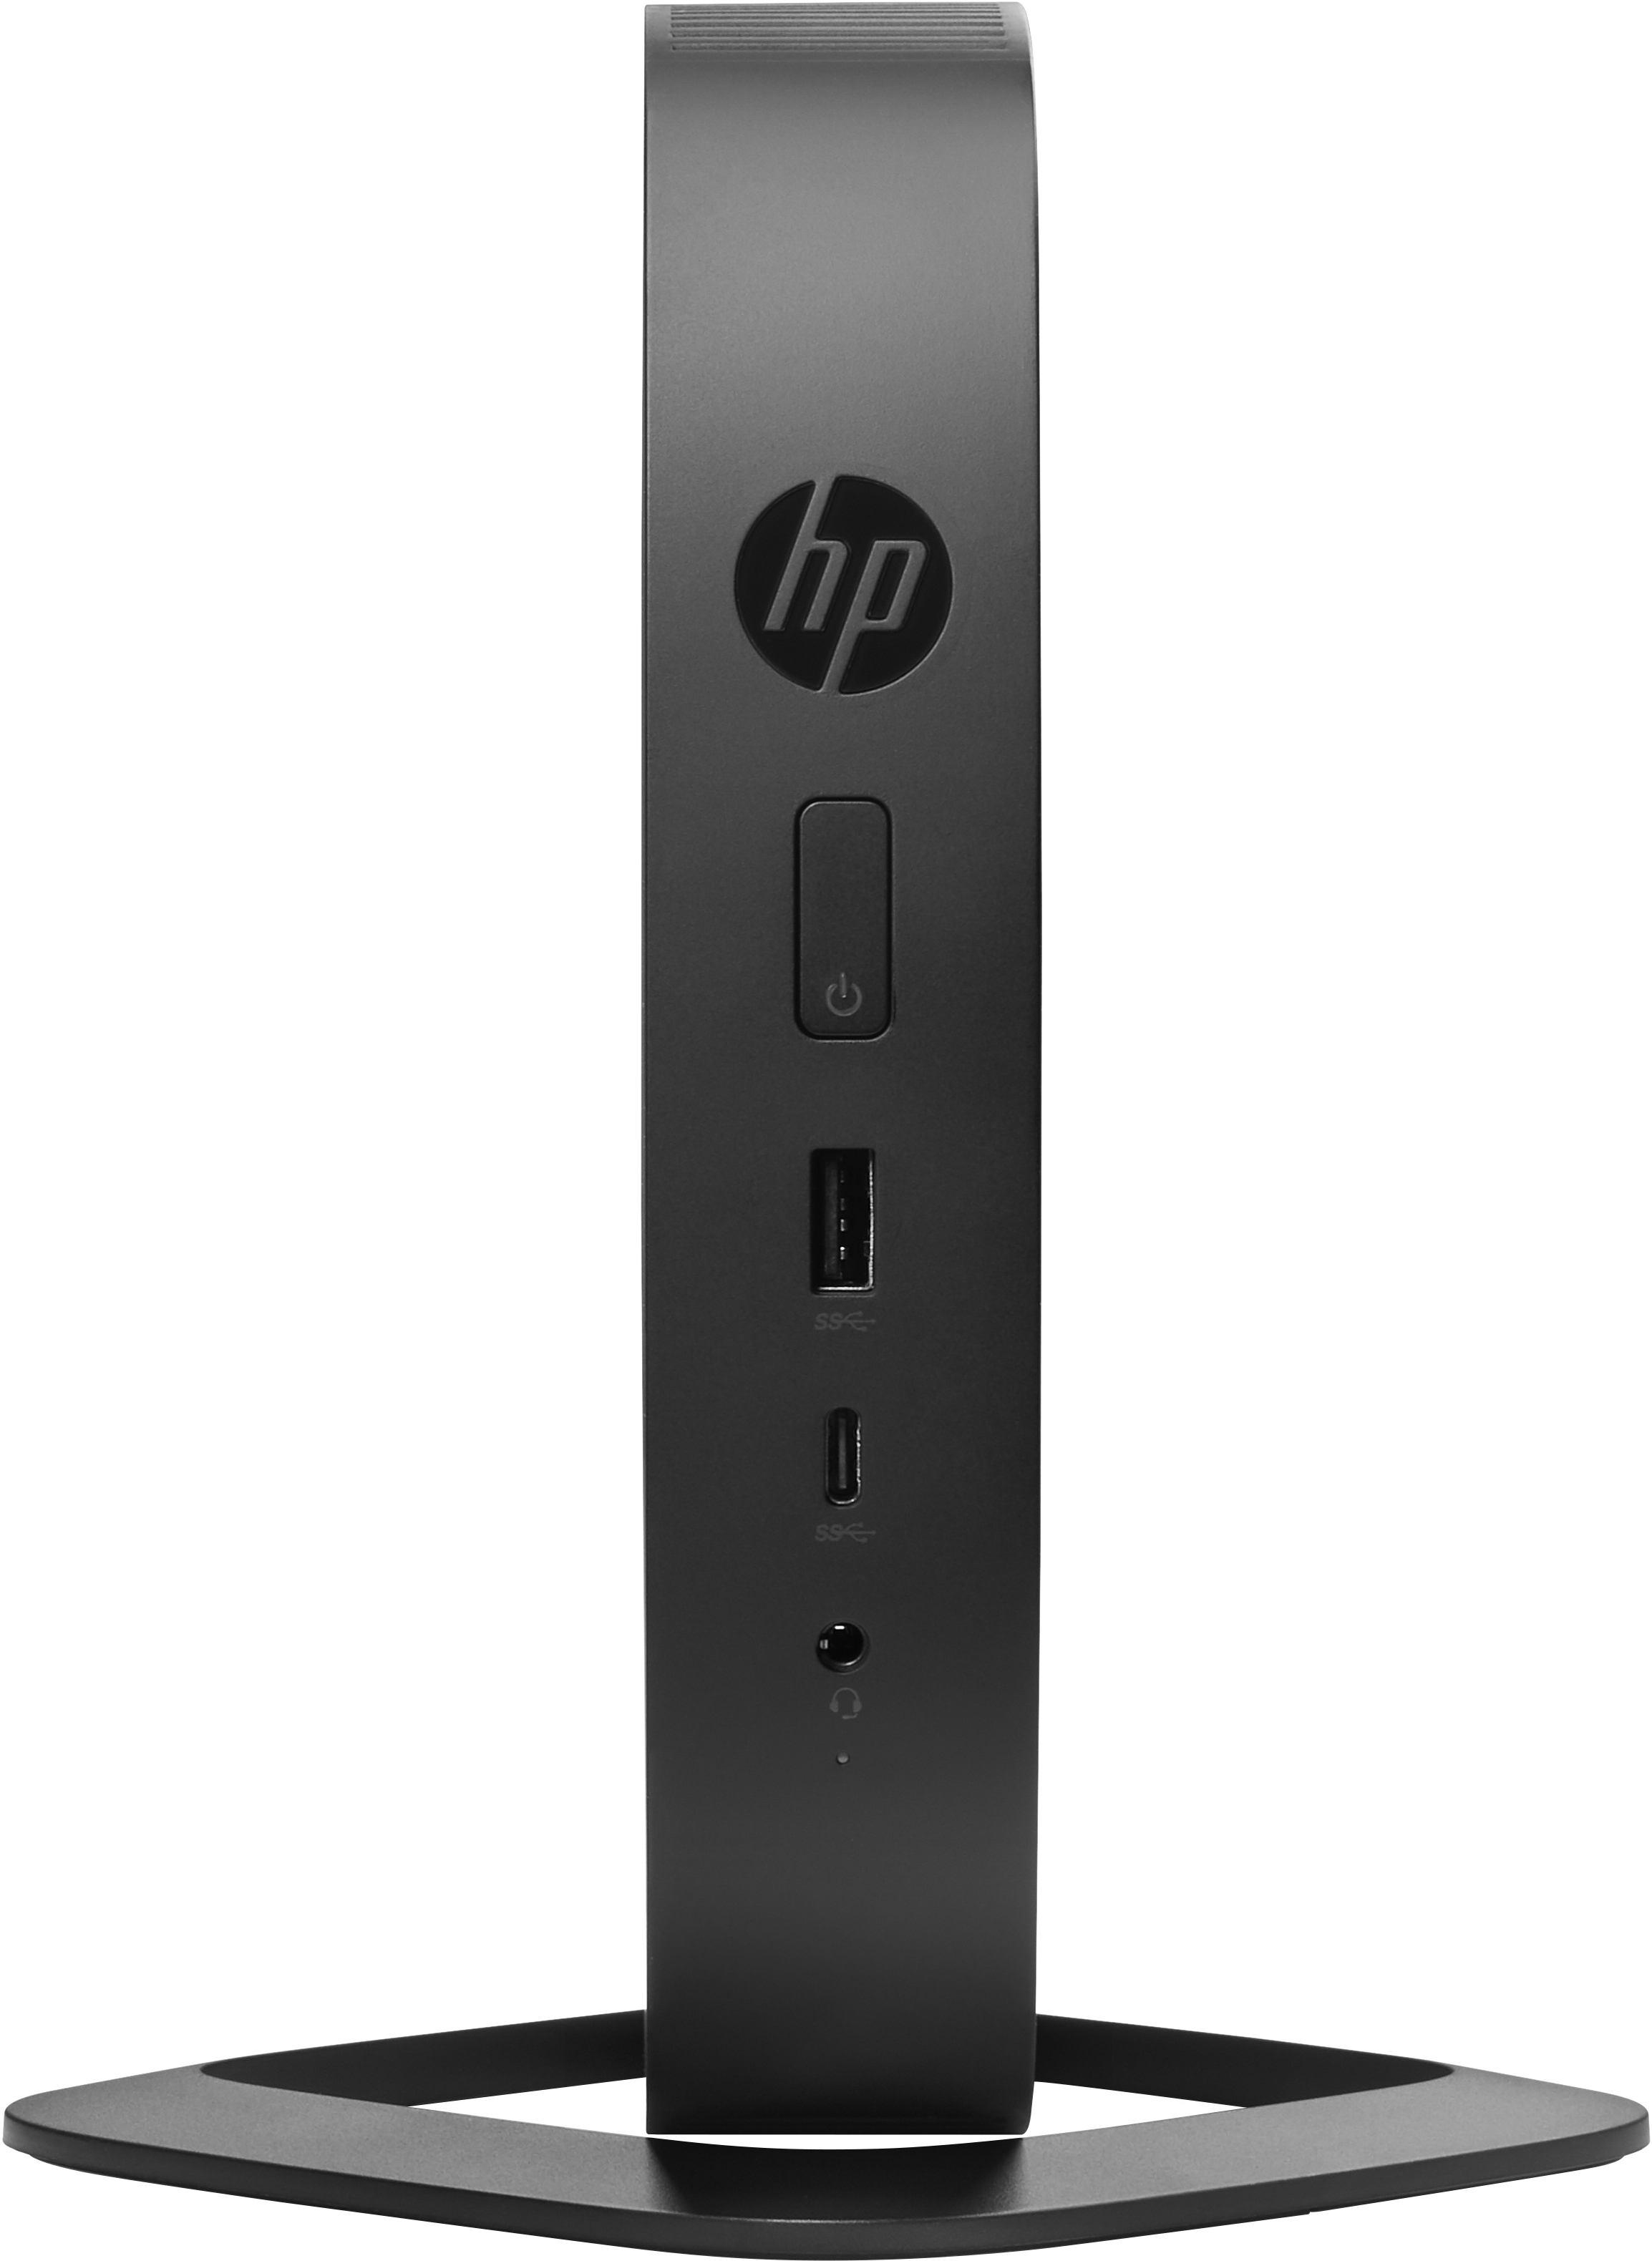 2022274-HP-t530-1-5-GHz-GX-215JJ-Nero-ThinPro-960-g-HP-t530-TP-4GR-W-V-German